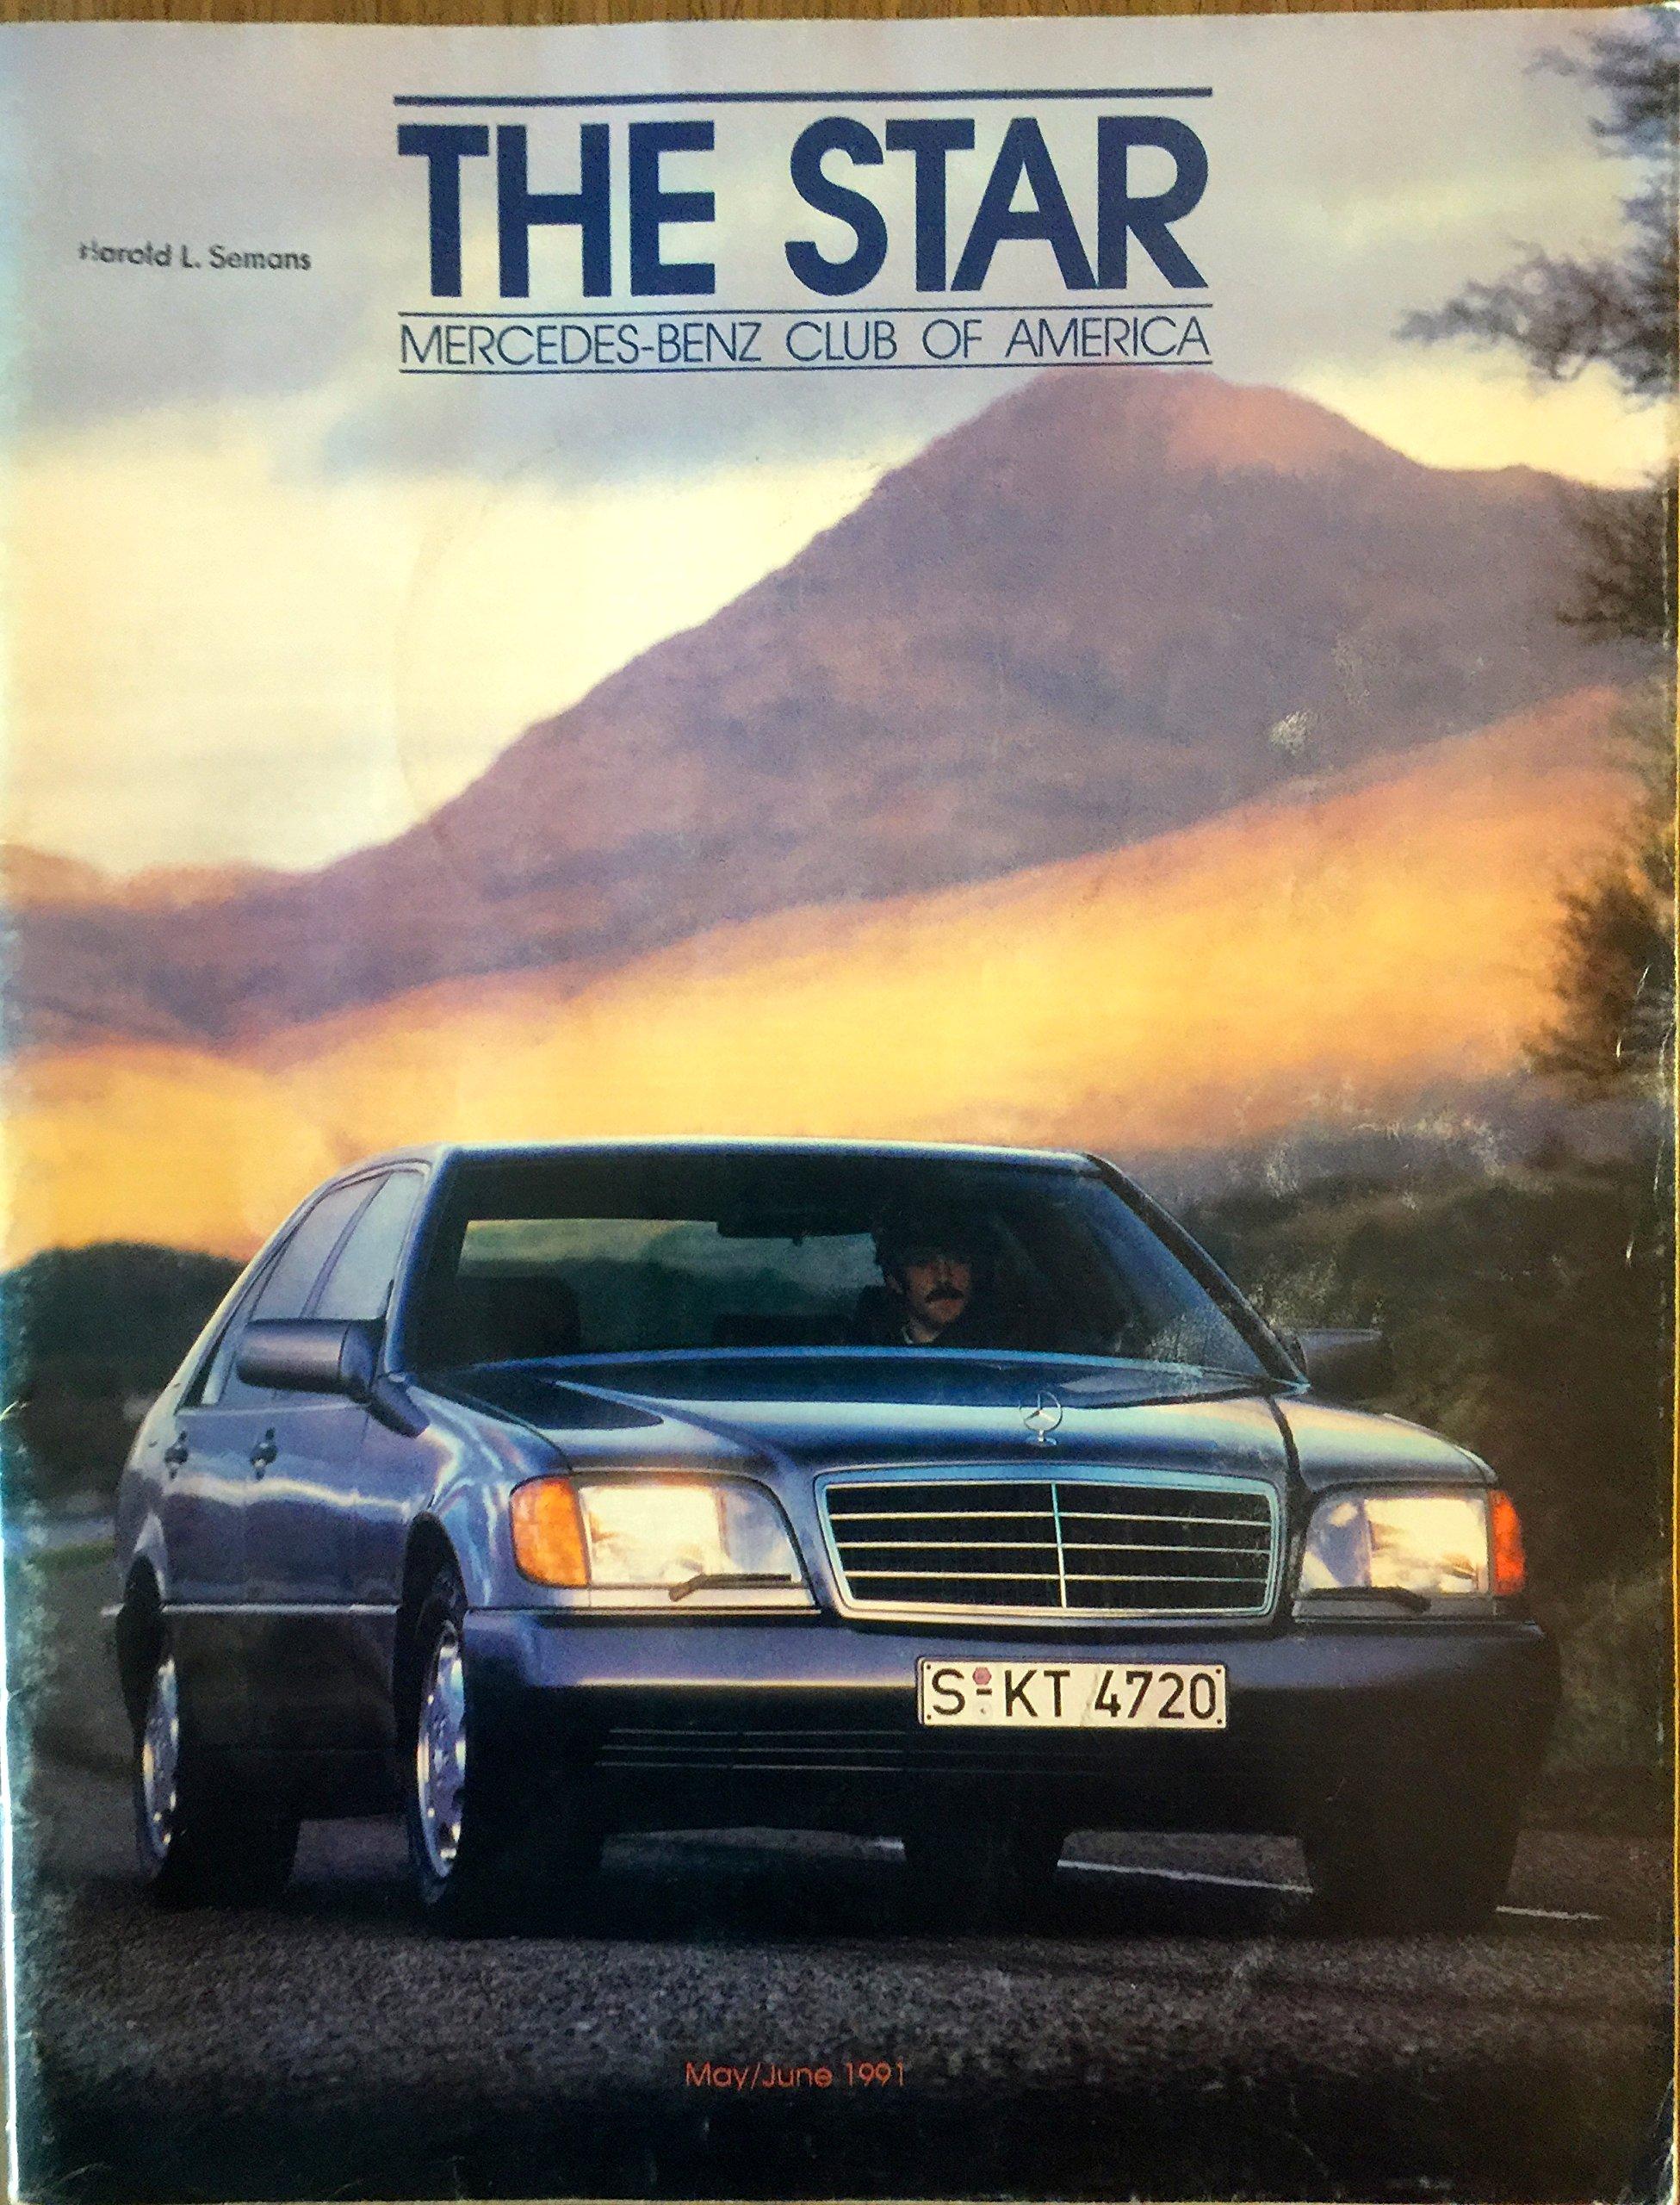 The Star Mercedes Benz Club Of America, Volume 36, Number 3, May/June 1991:  Mercedes Benz Club Of America, Frank Barrett: Amazon.com: Books